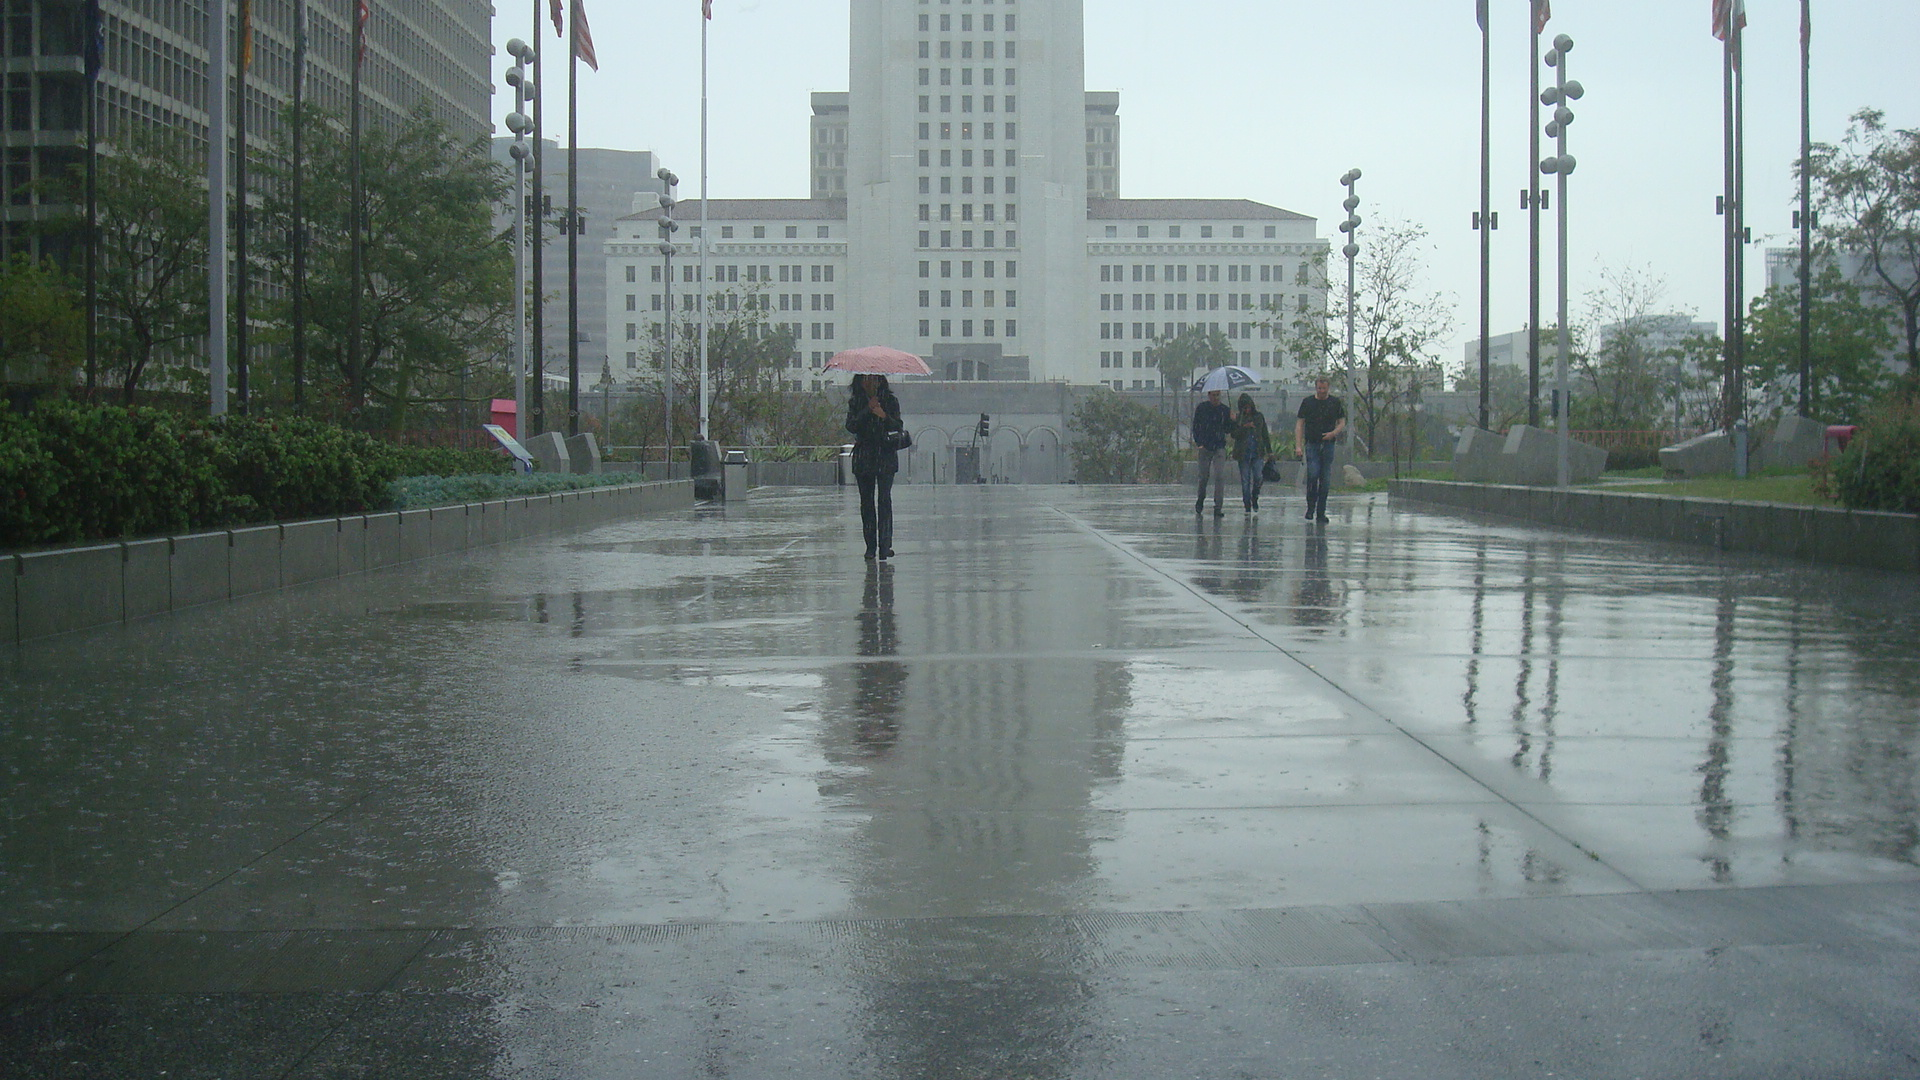 Rain 01 Woman Umb